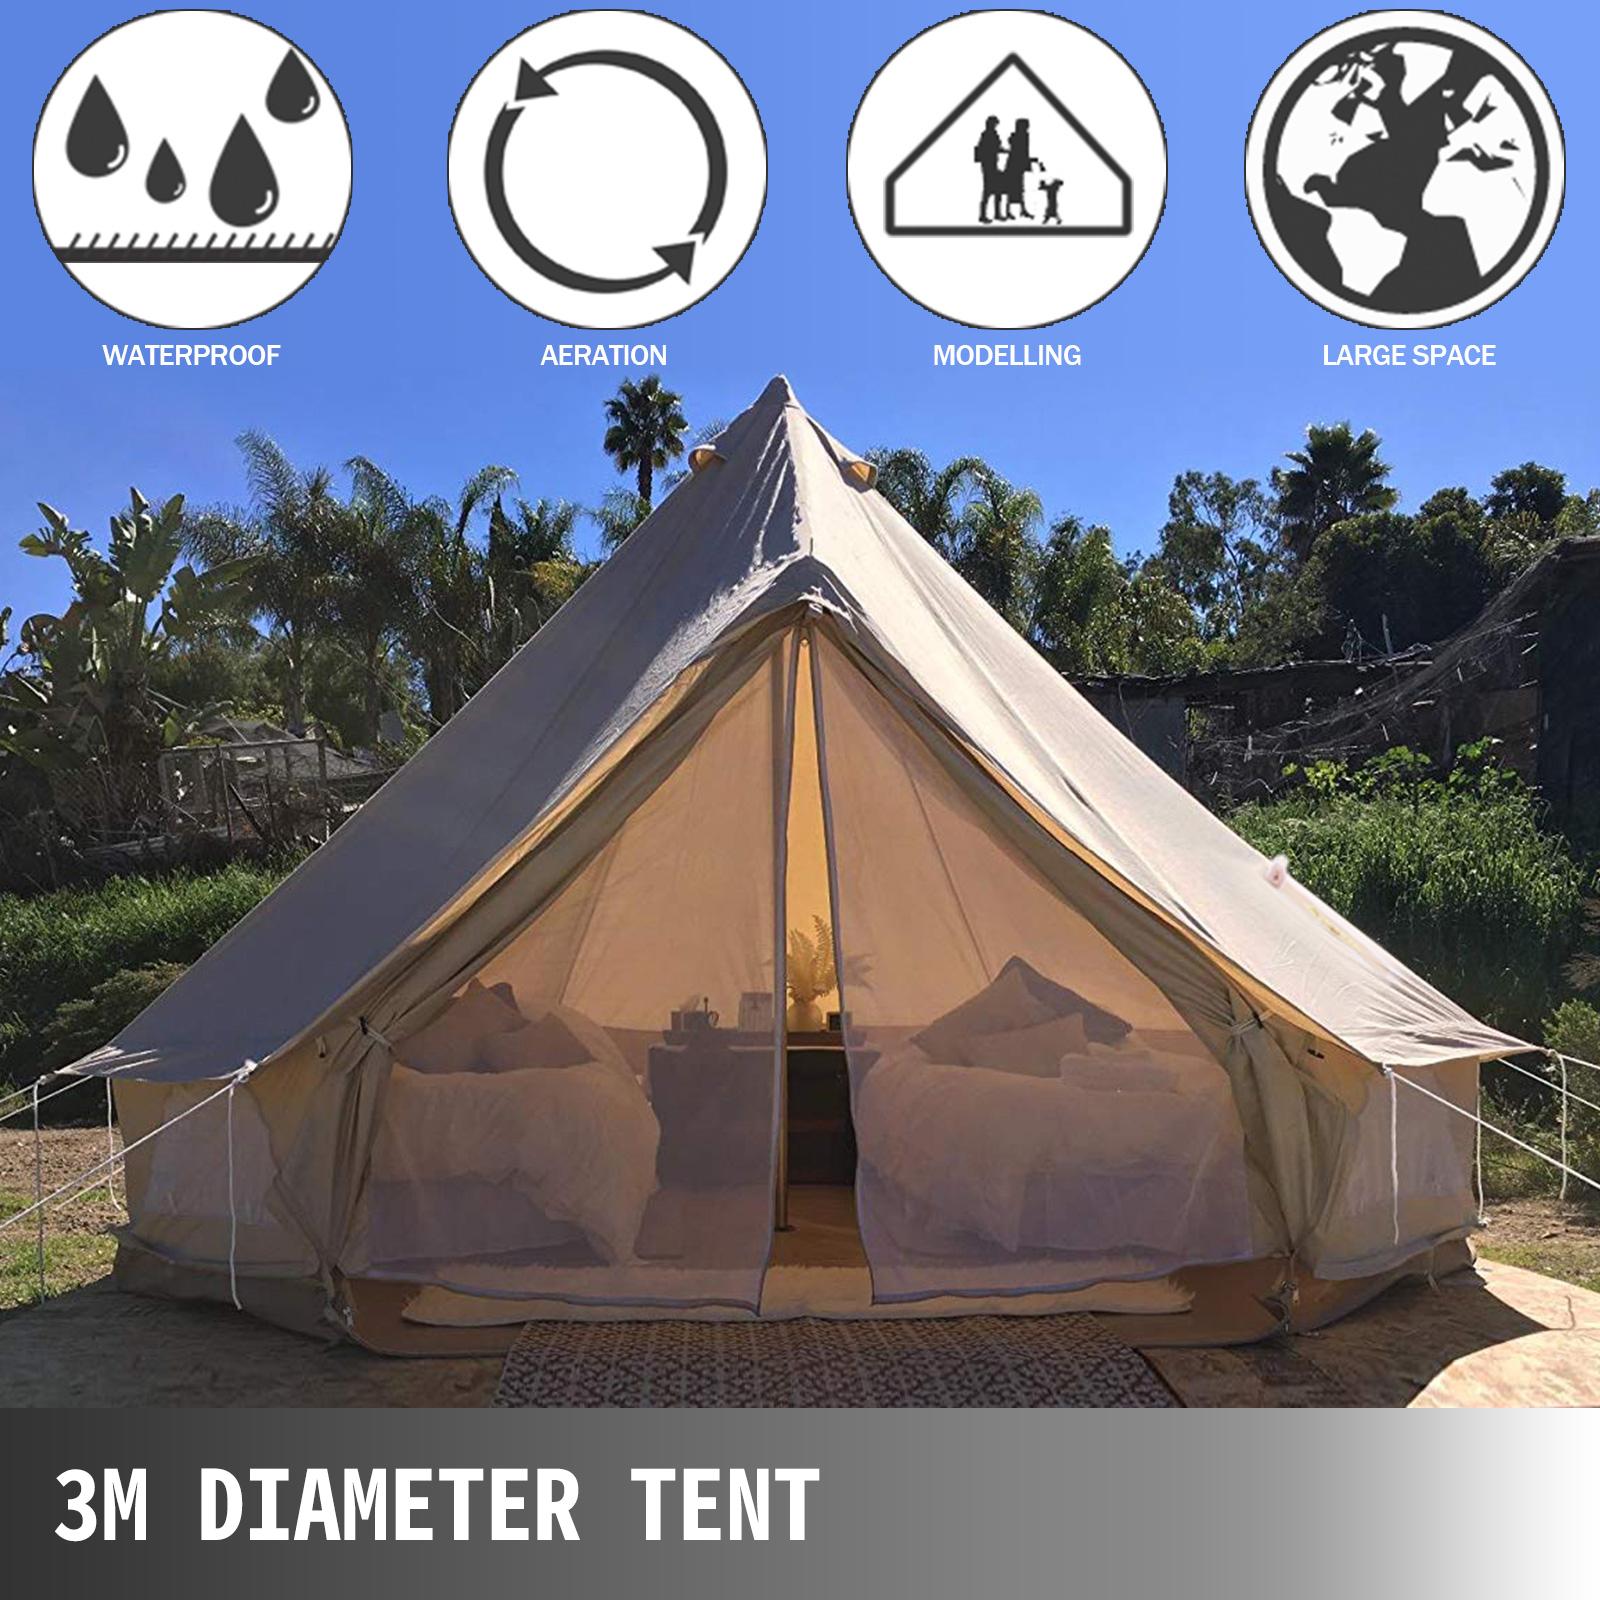 4-Season-Bell-Tent-3-4-5-6M-Waterproof-Cotton-Canvas-Glamping-Camping-Beach-US thumbnail 16